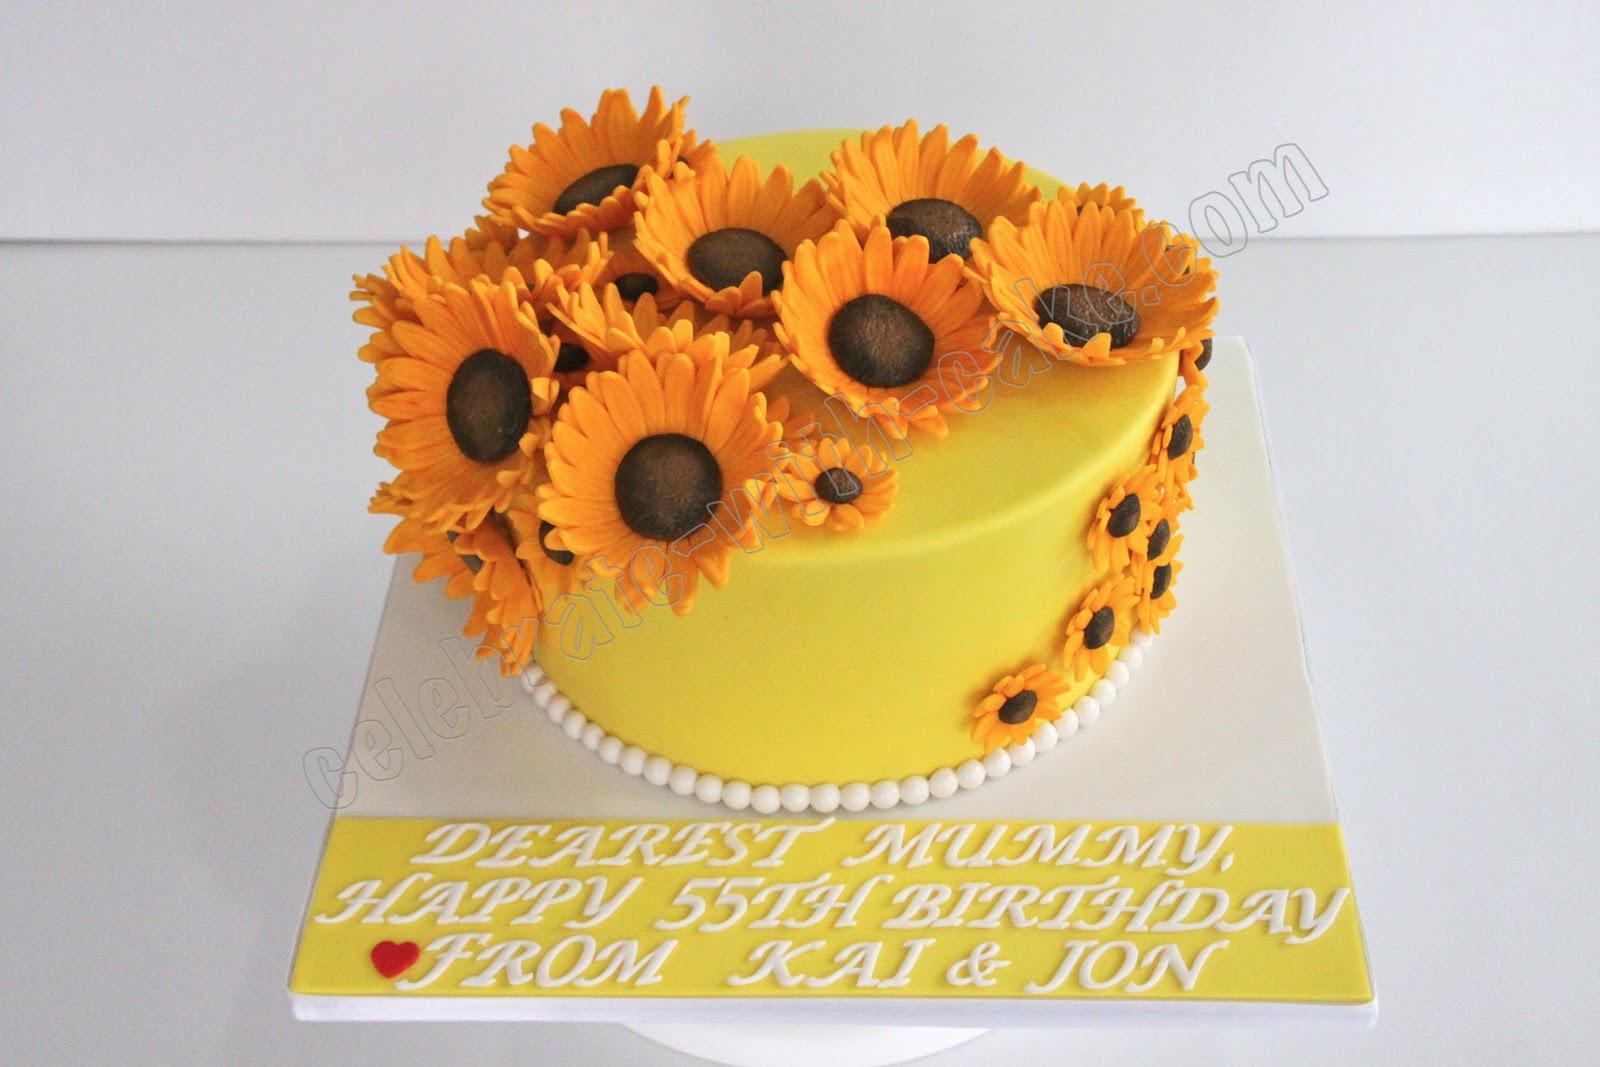 Celebrate with Cake Sunflower Themed Cake